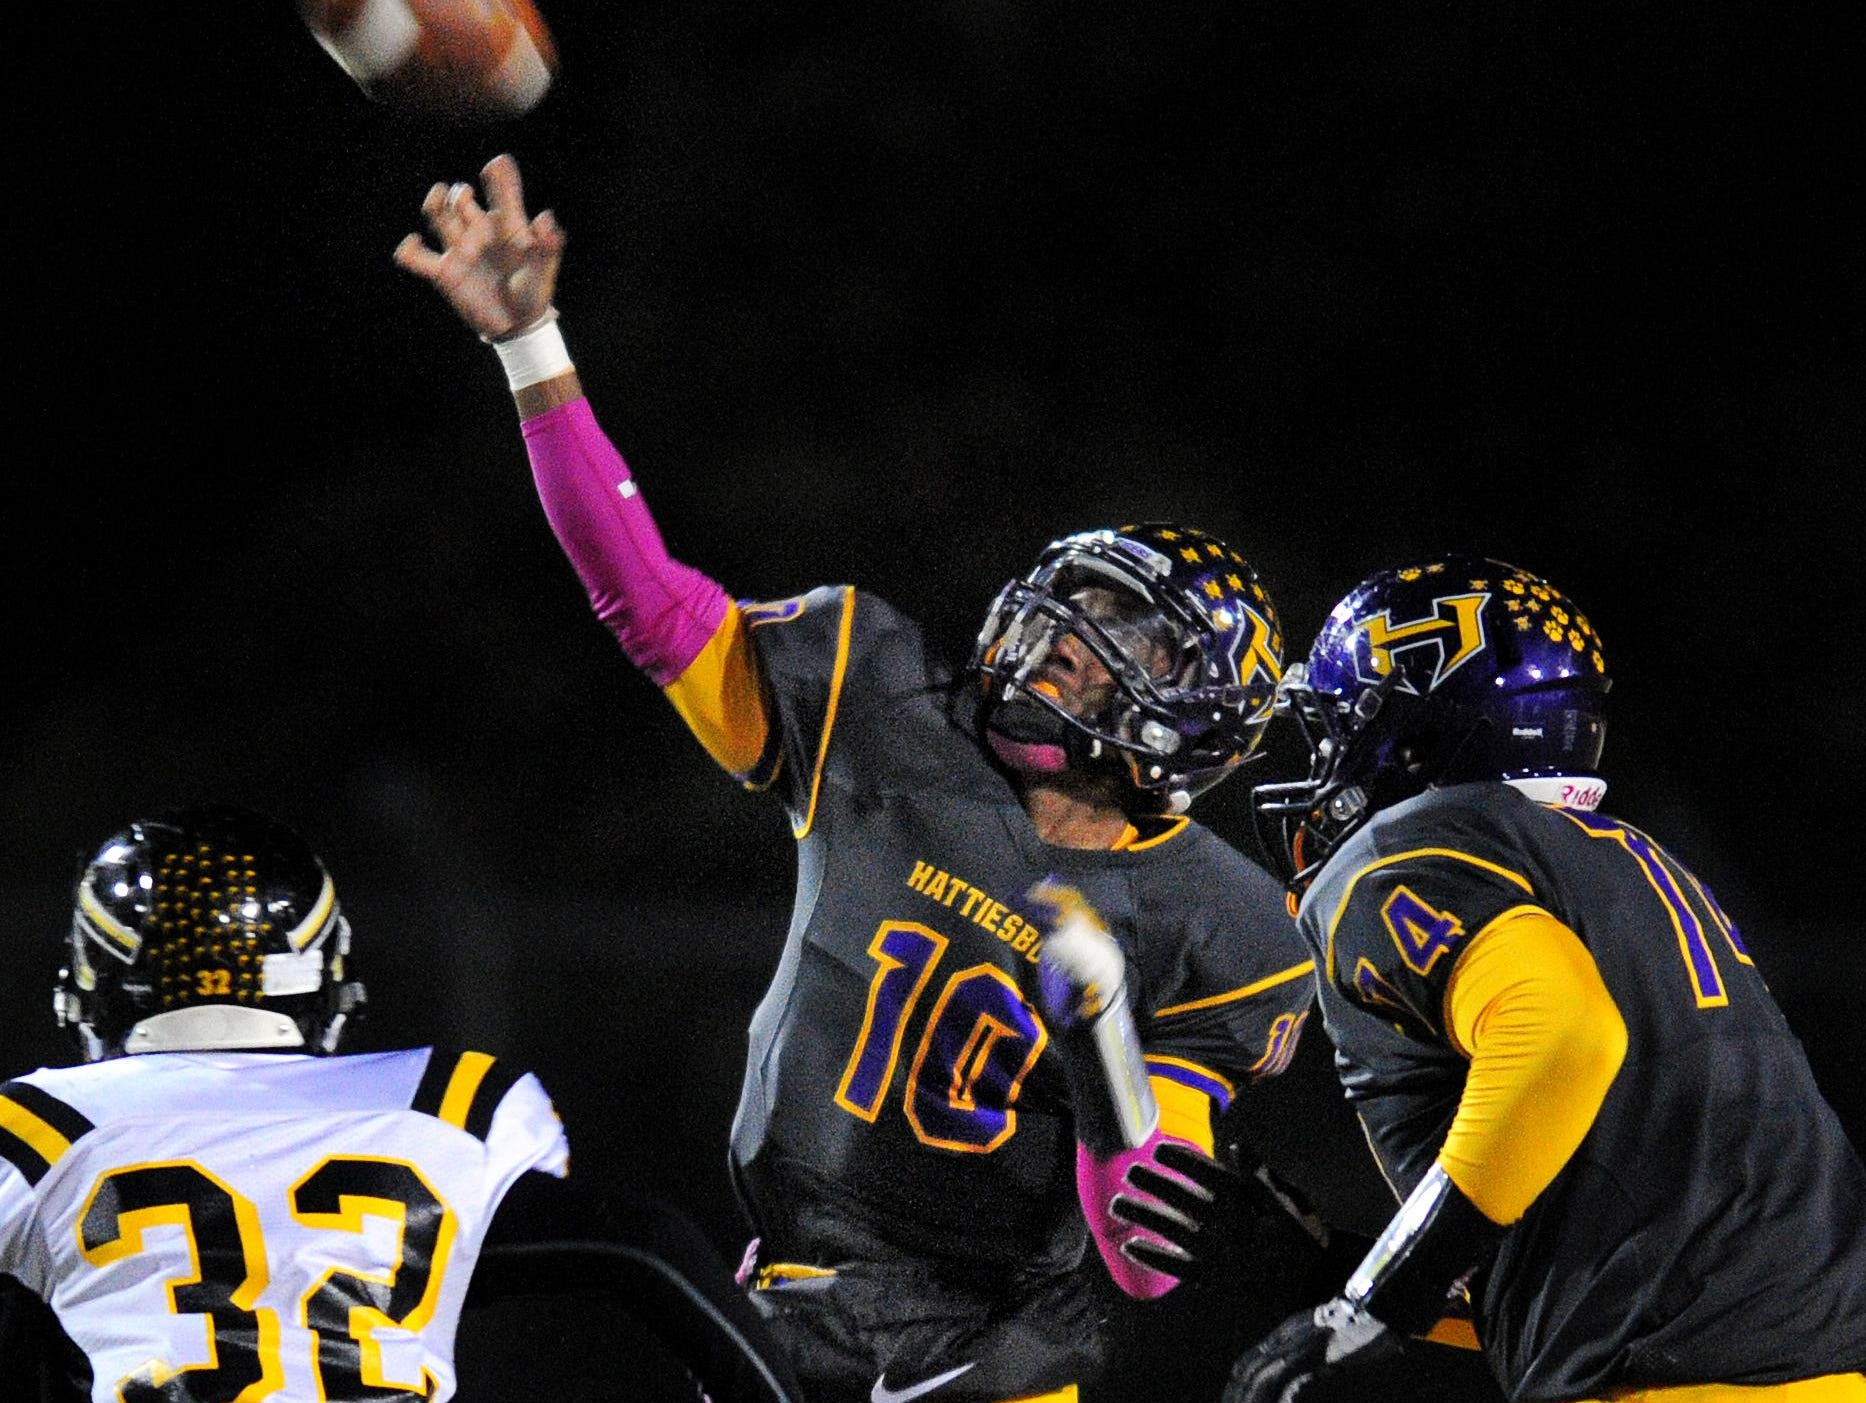 Junior quarterback Julian Conner will be a big key to Hattiesburg High's chances for success this season.